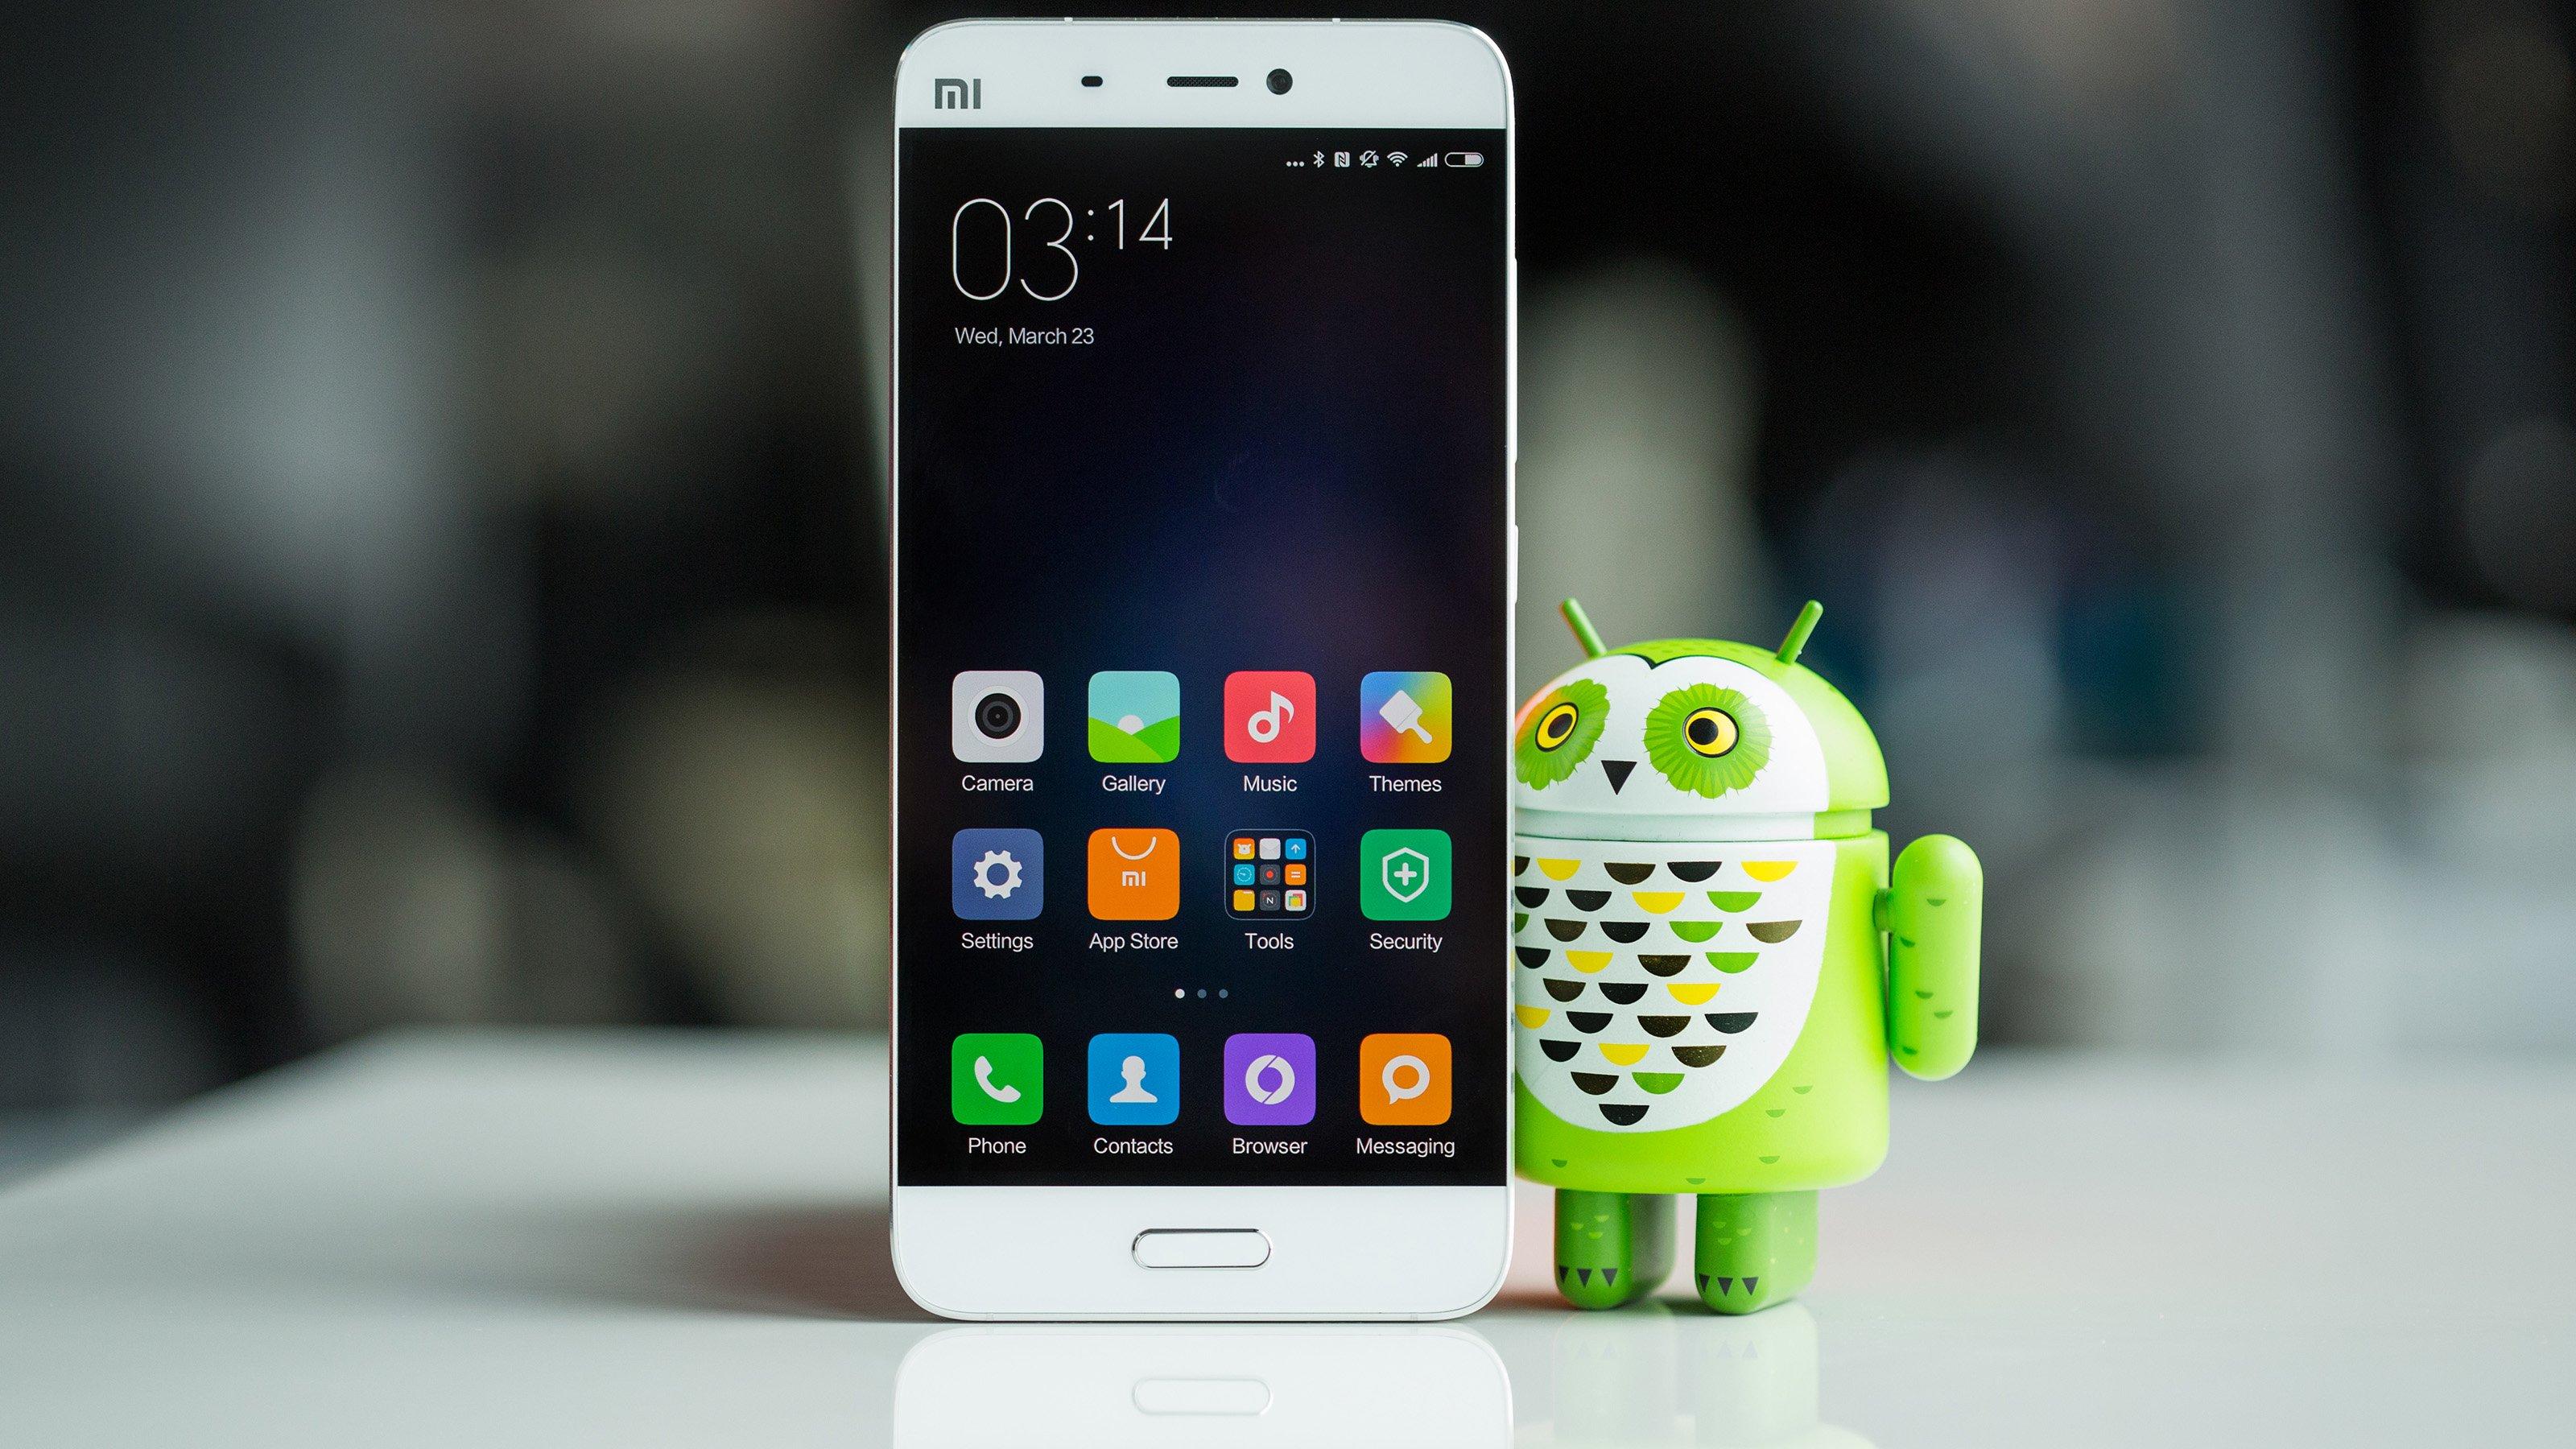 Test Du Xiaomi Mi 5 Un Grand Potentiel Quelque Peu Gache